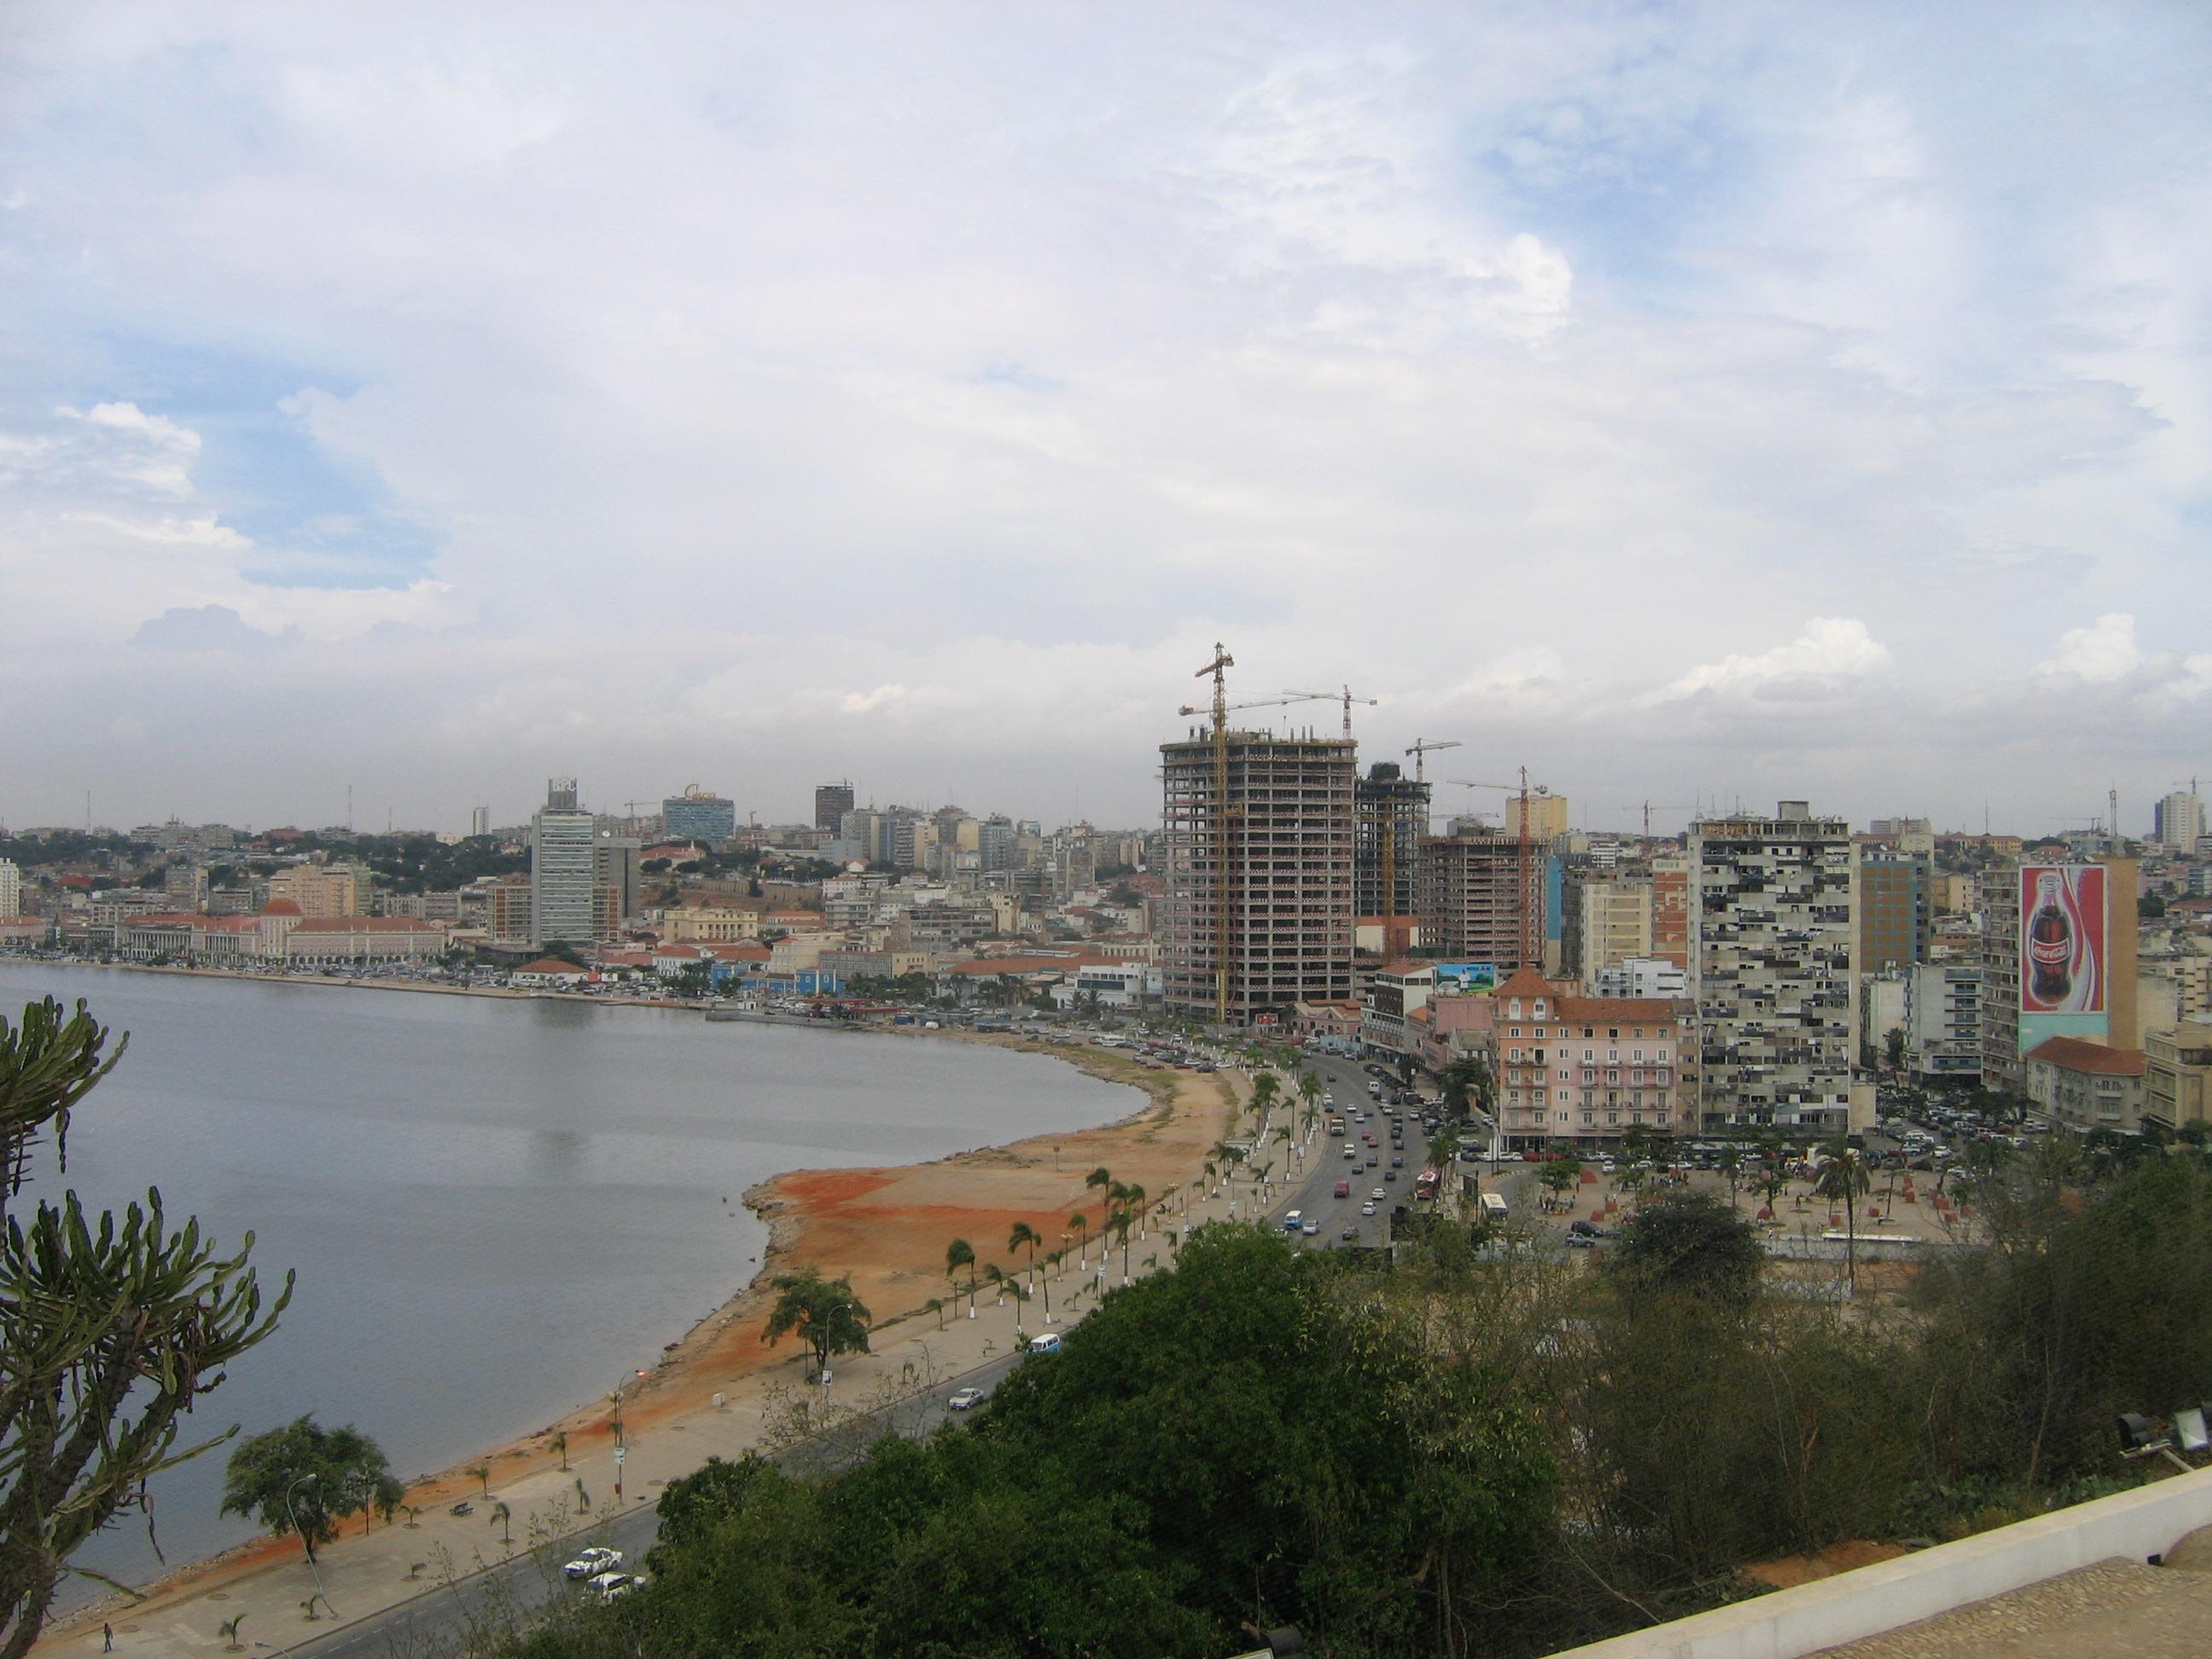 Zip code luanda angola